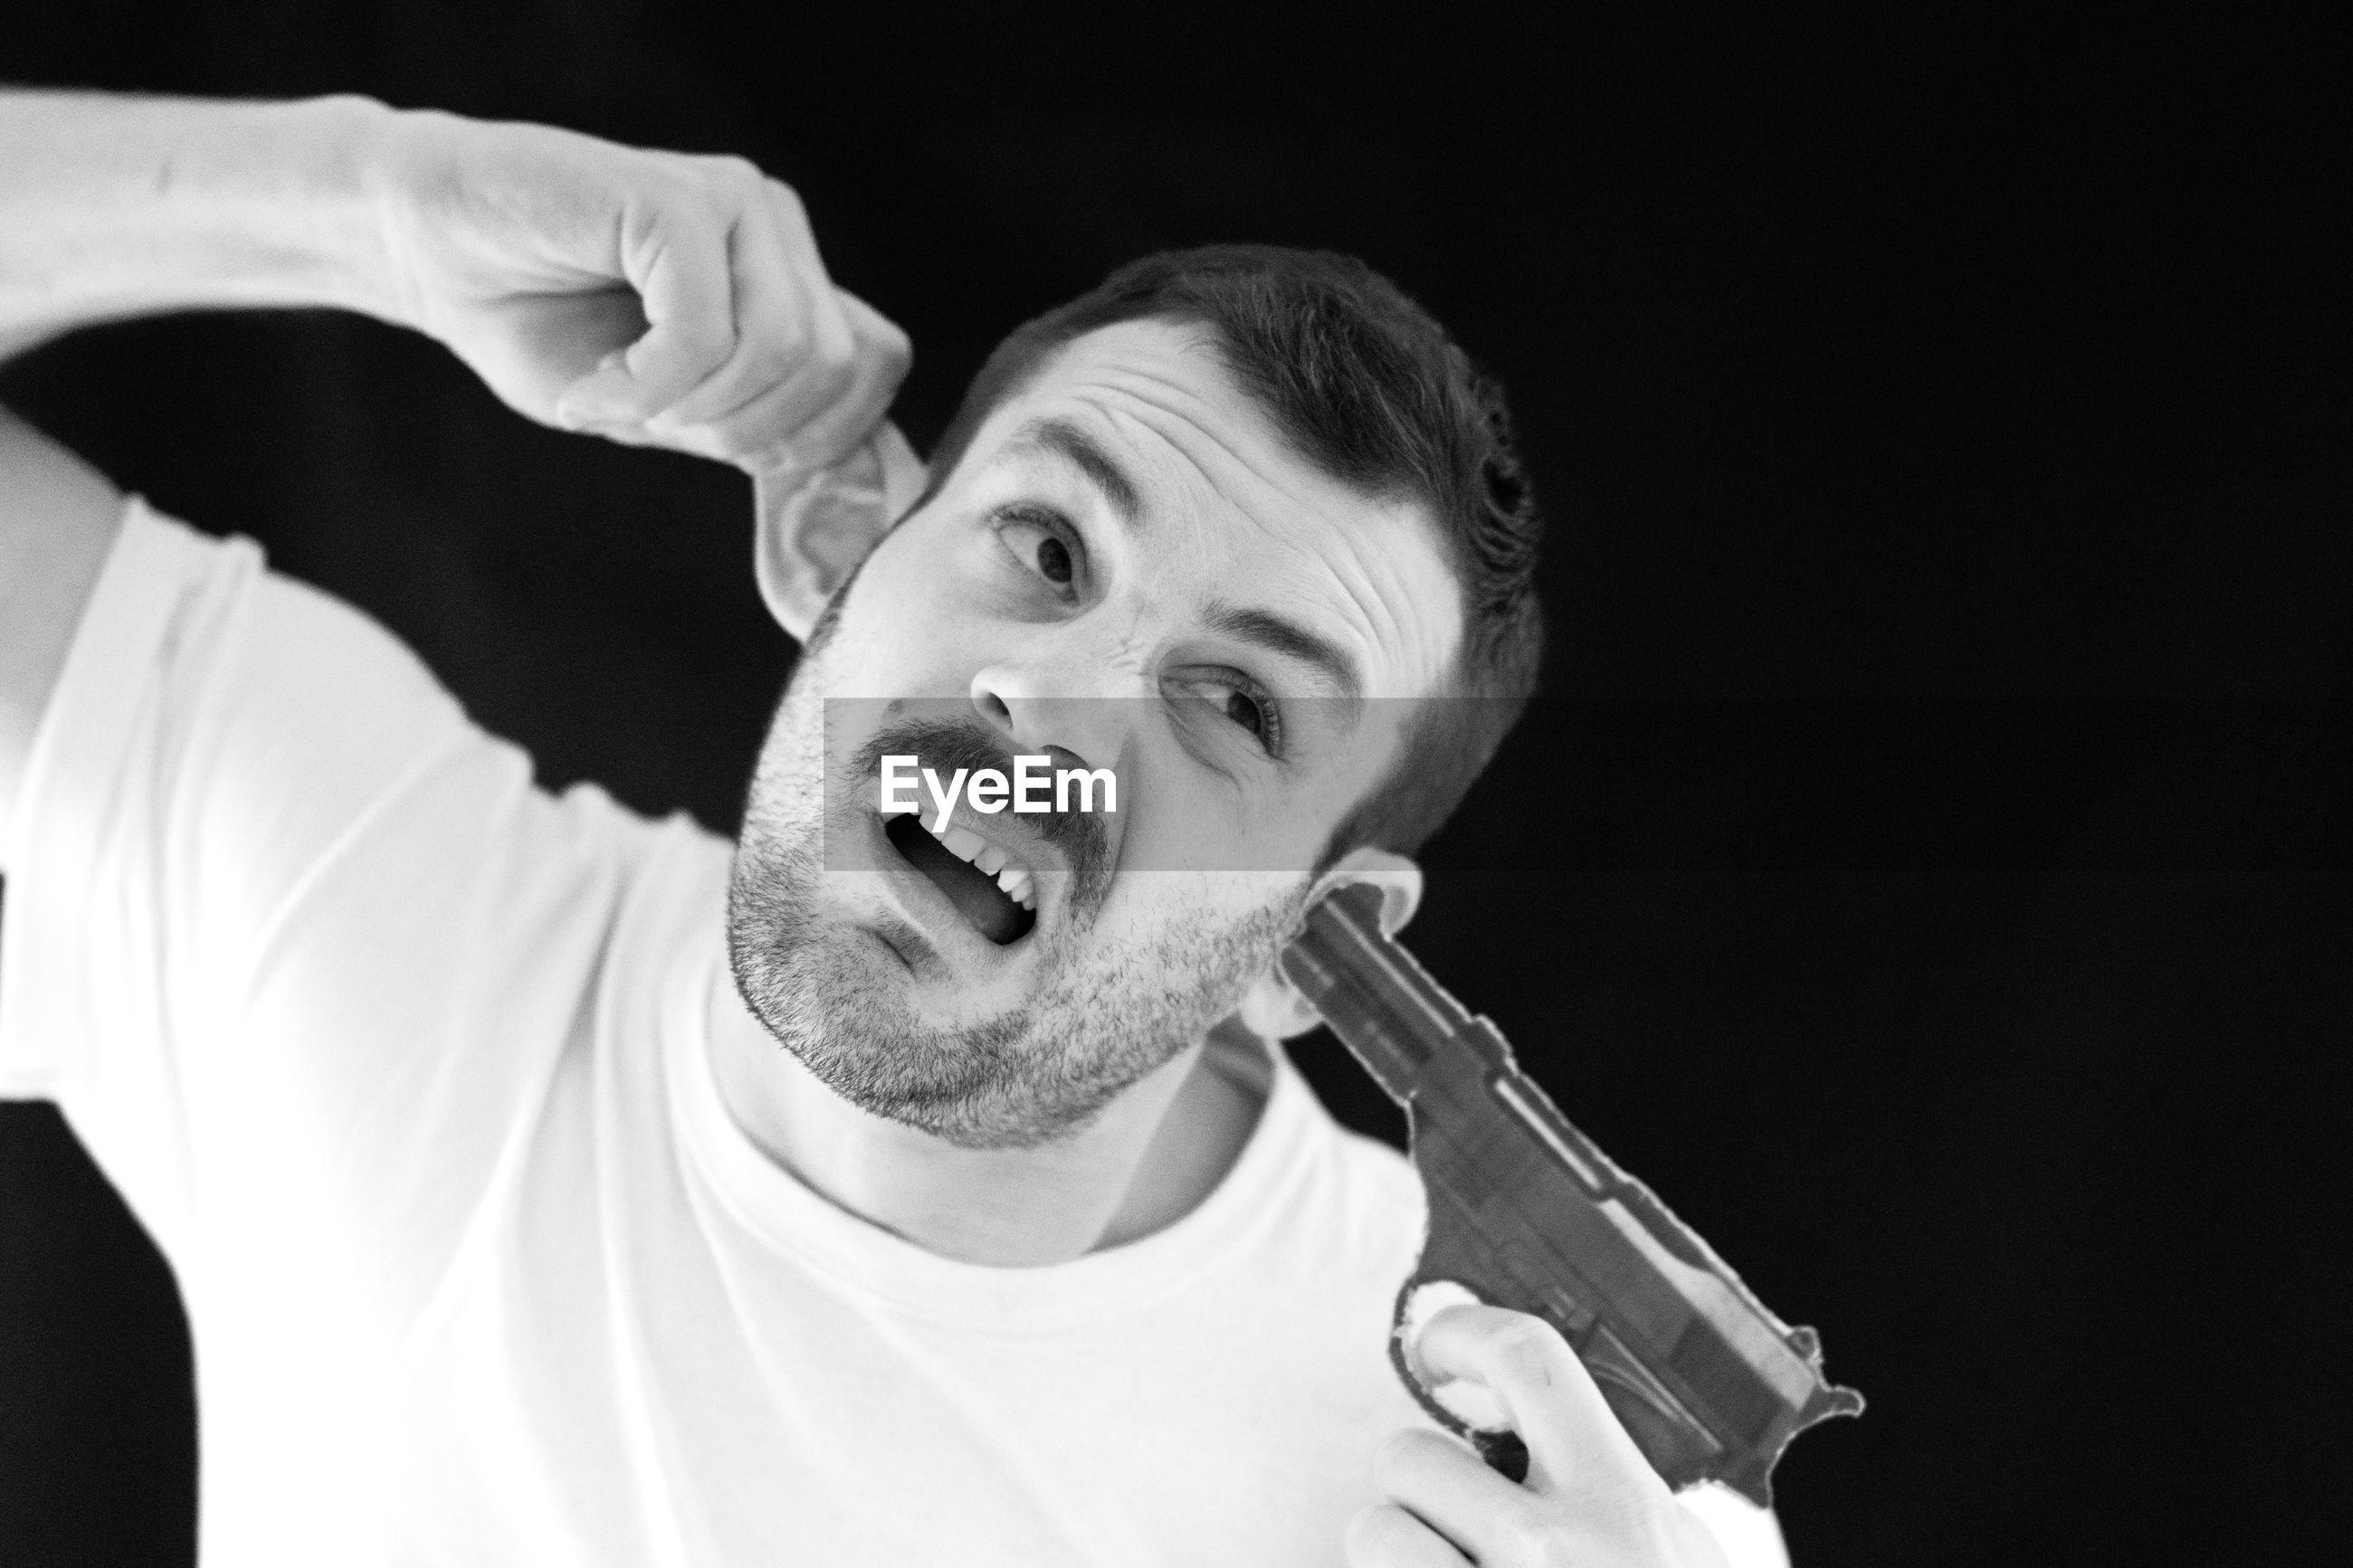 Man pointing gun in ear against black background